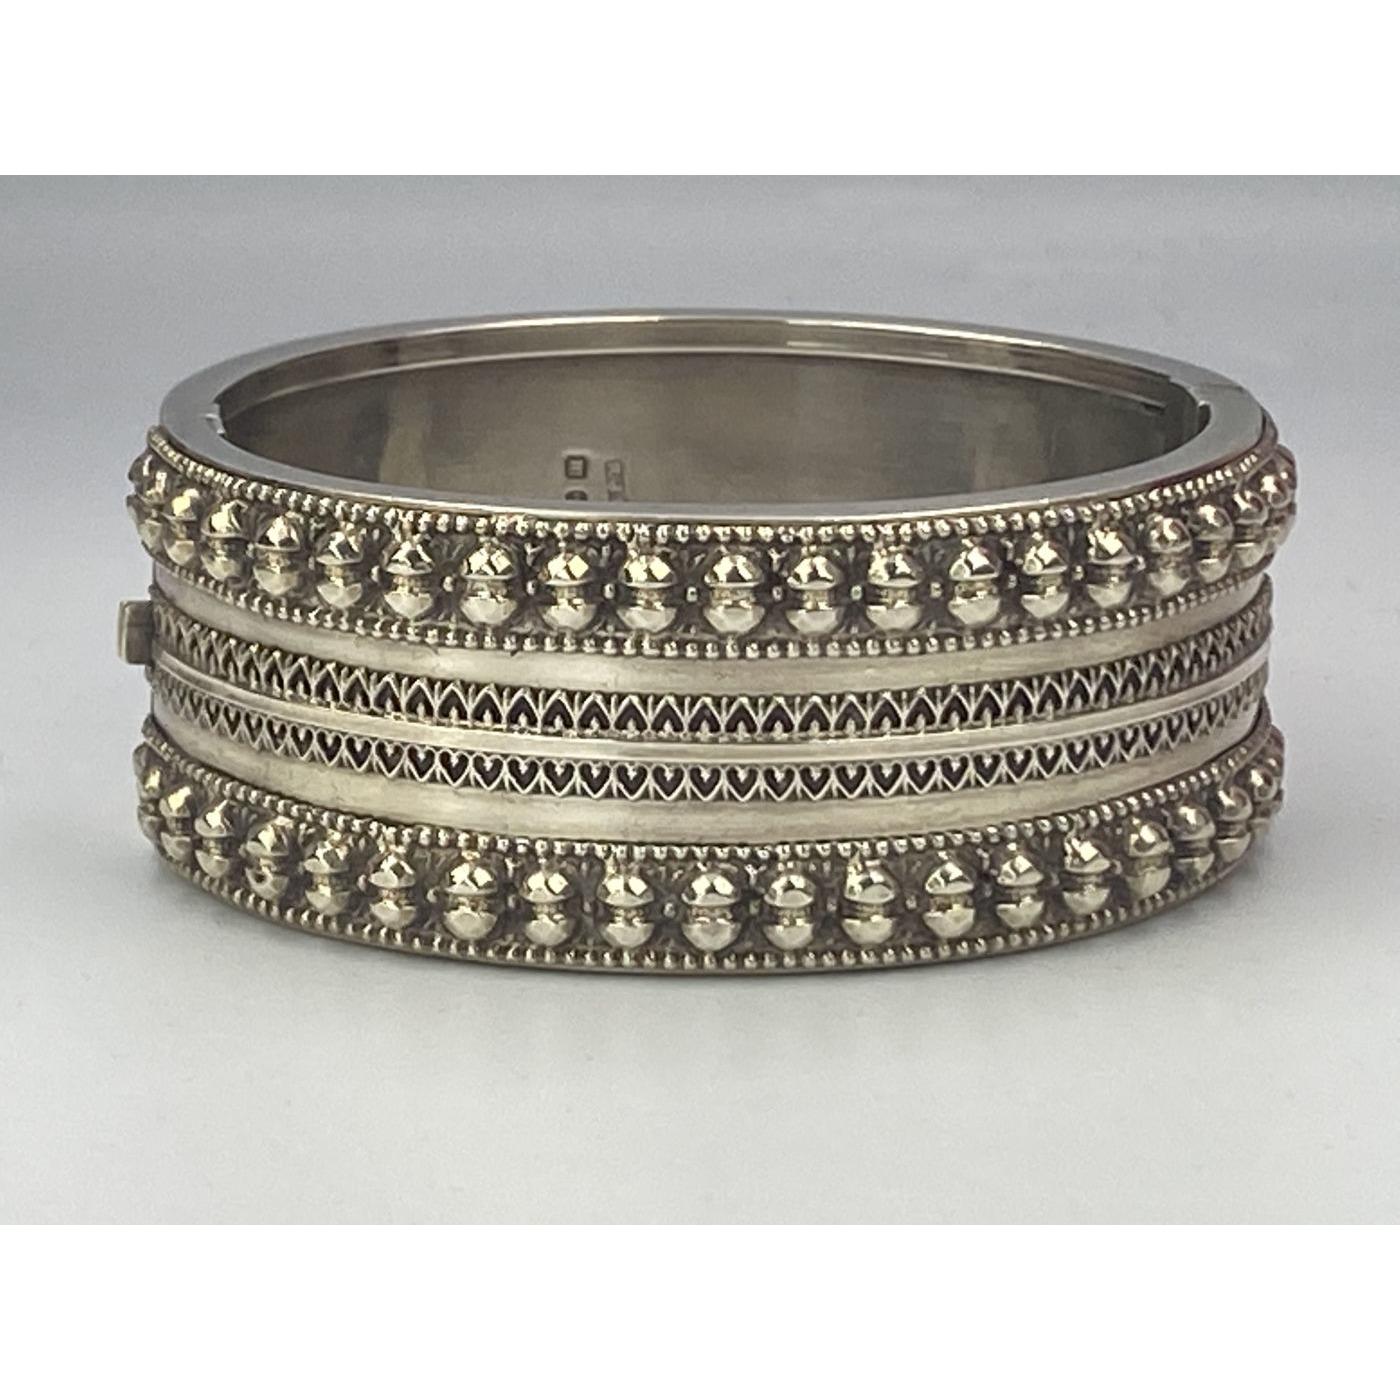 Studded, Beaded, Gallery Work, Geometric English Silver Bangle